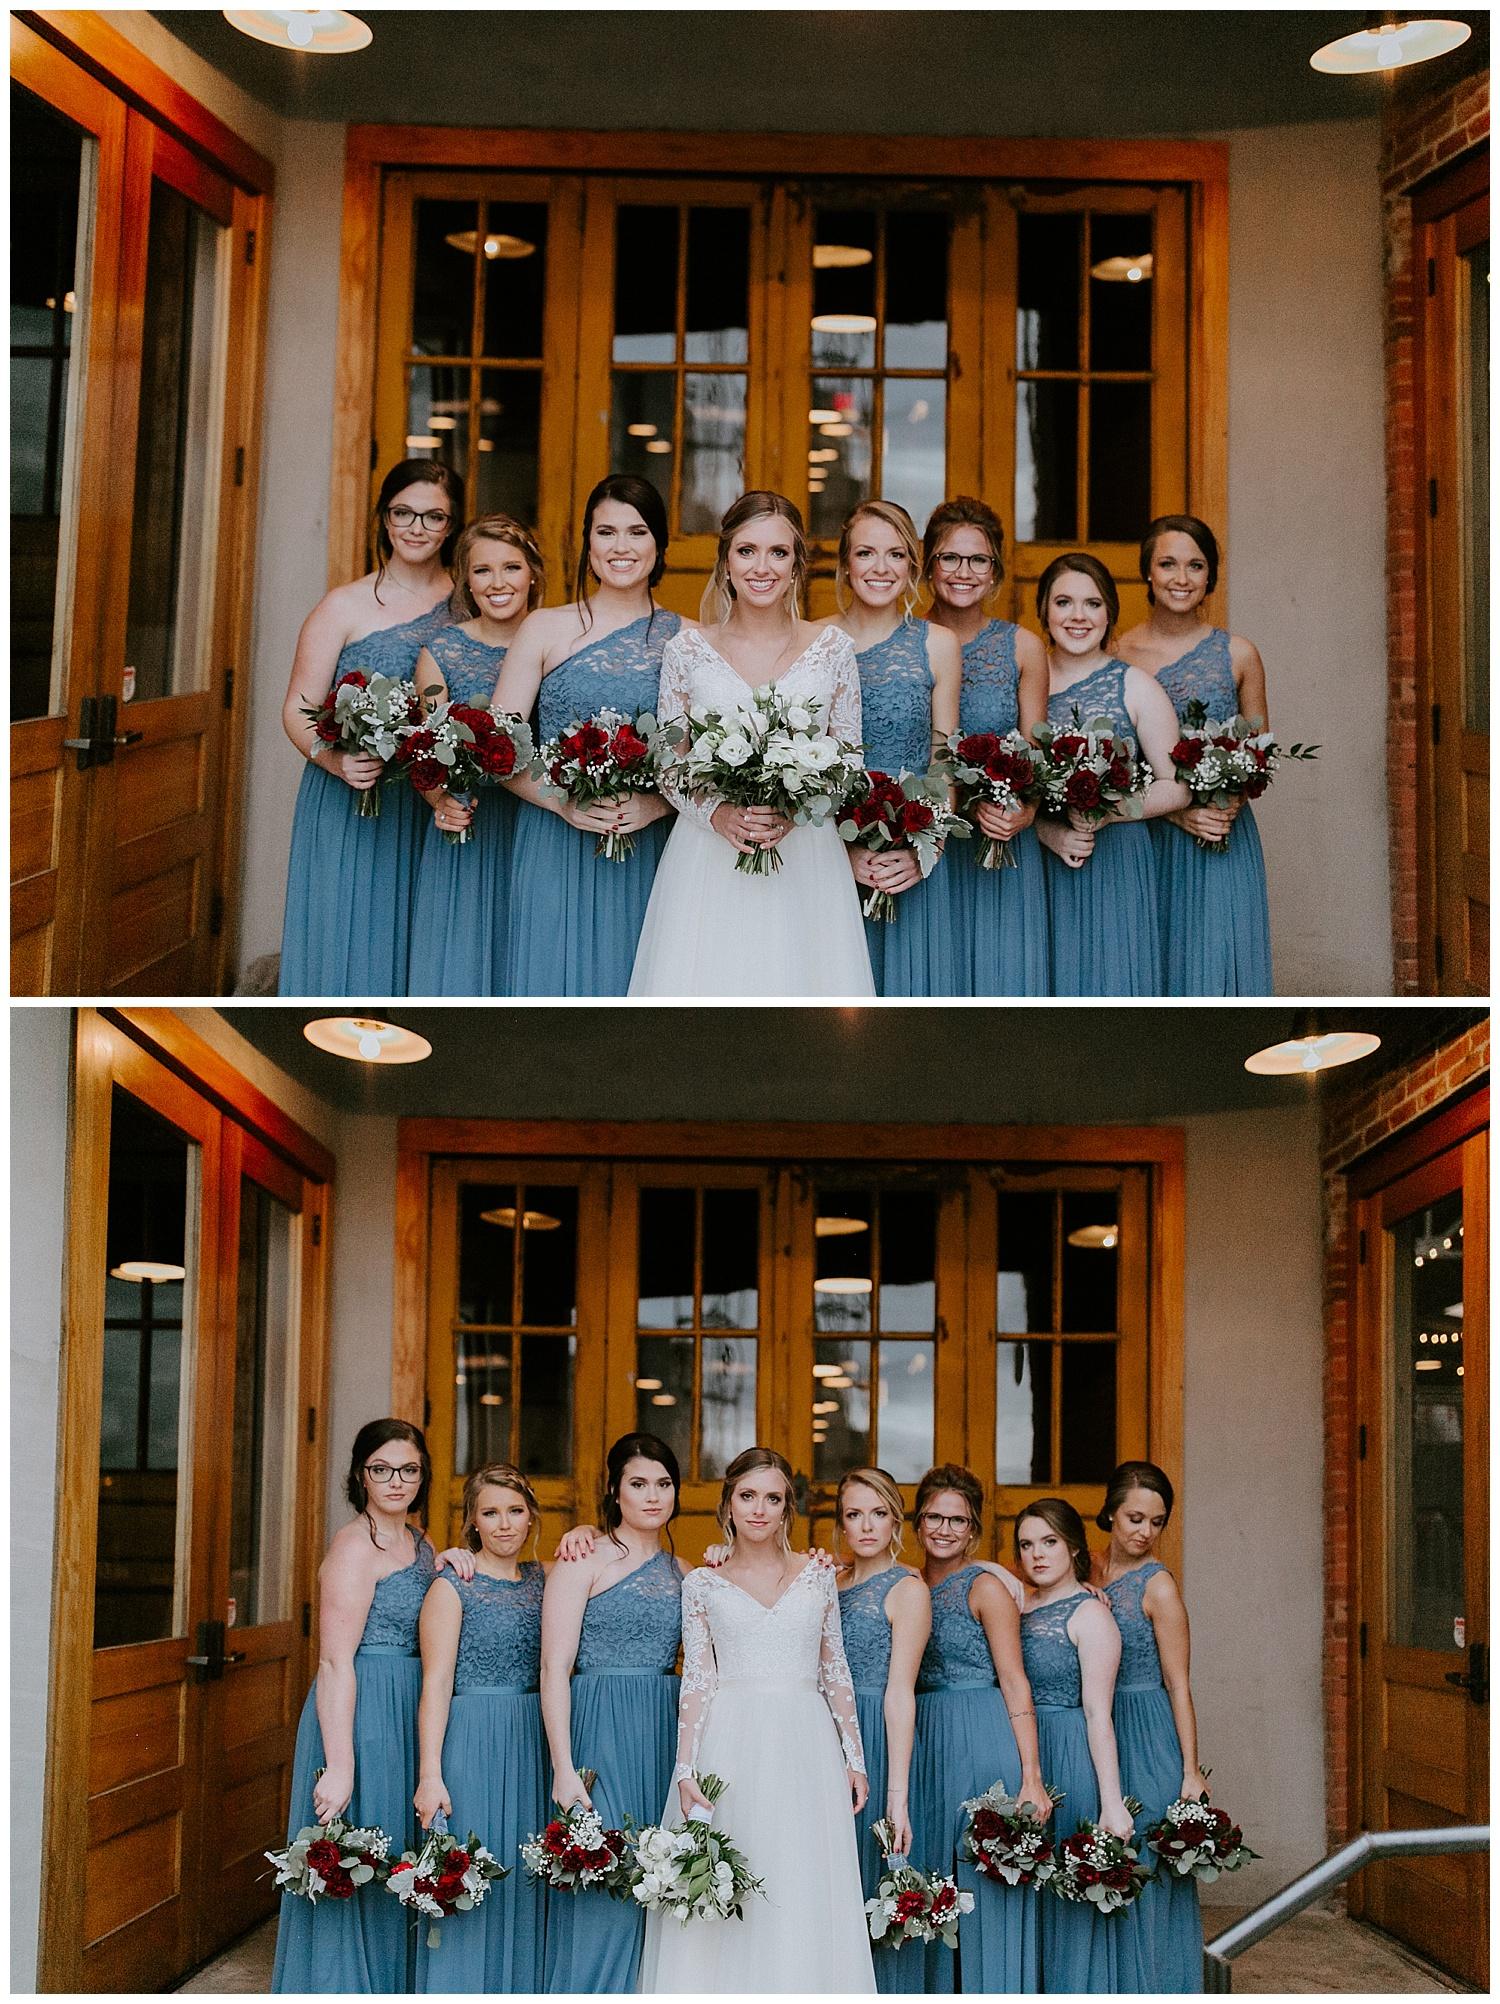 winter-wedding-the standard-knoxville_2019-01-23_0066.jpg